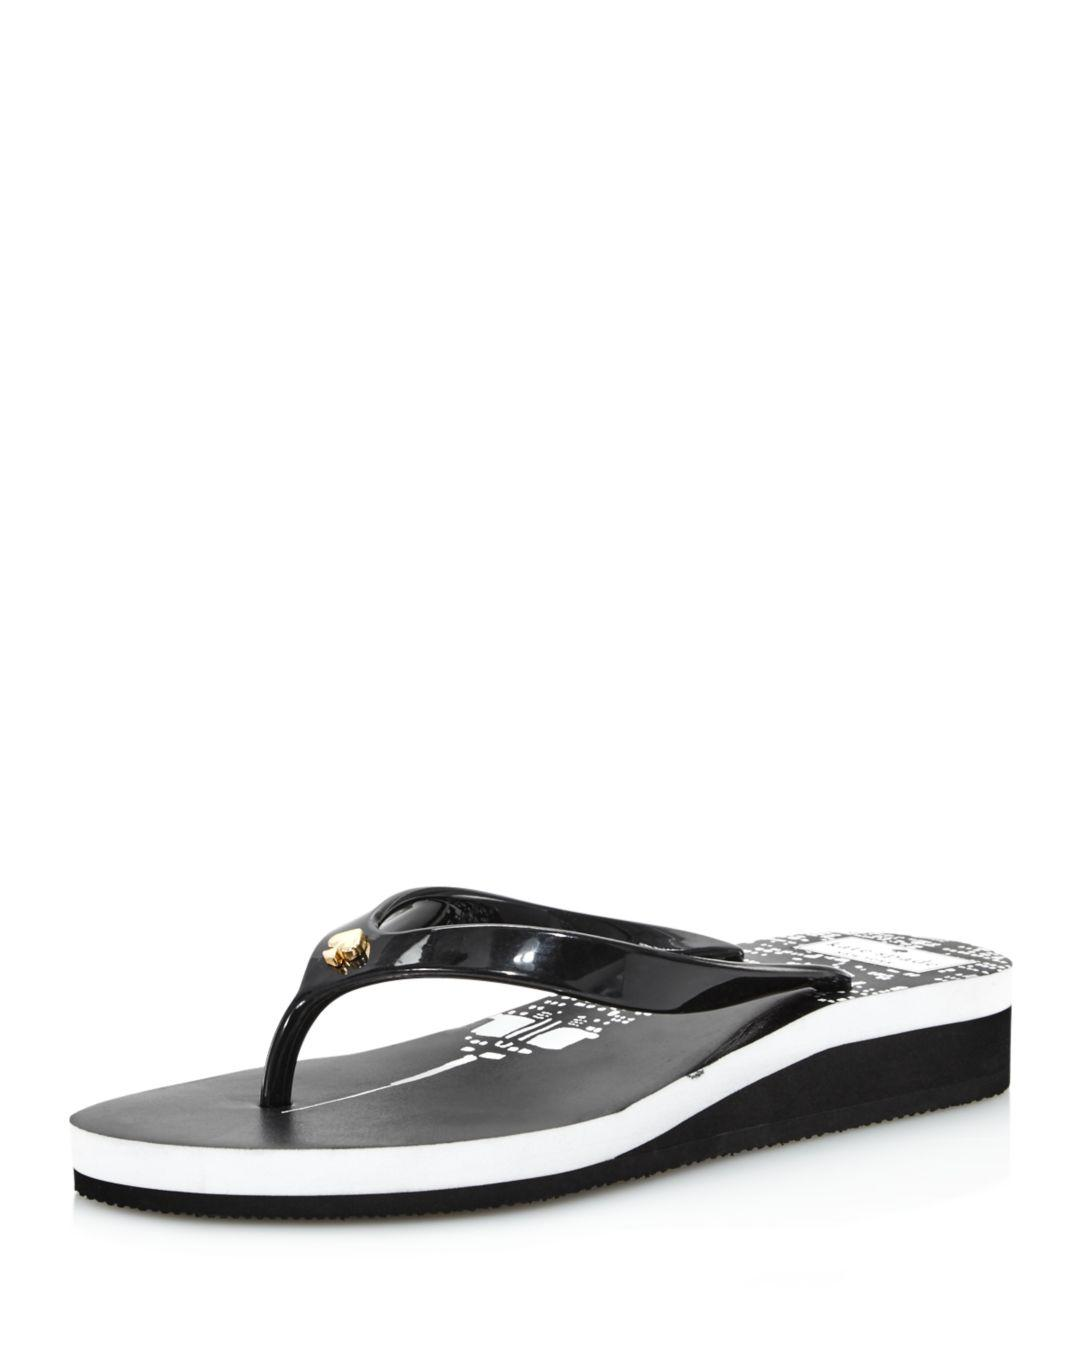 7a05c613df21 Lyst - Kate Spade Women s Milli Platform Flip-flops in Black